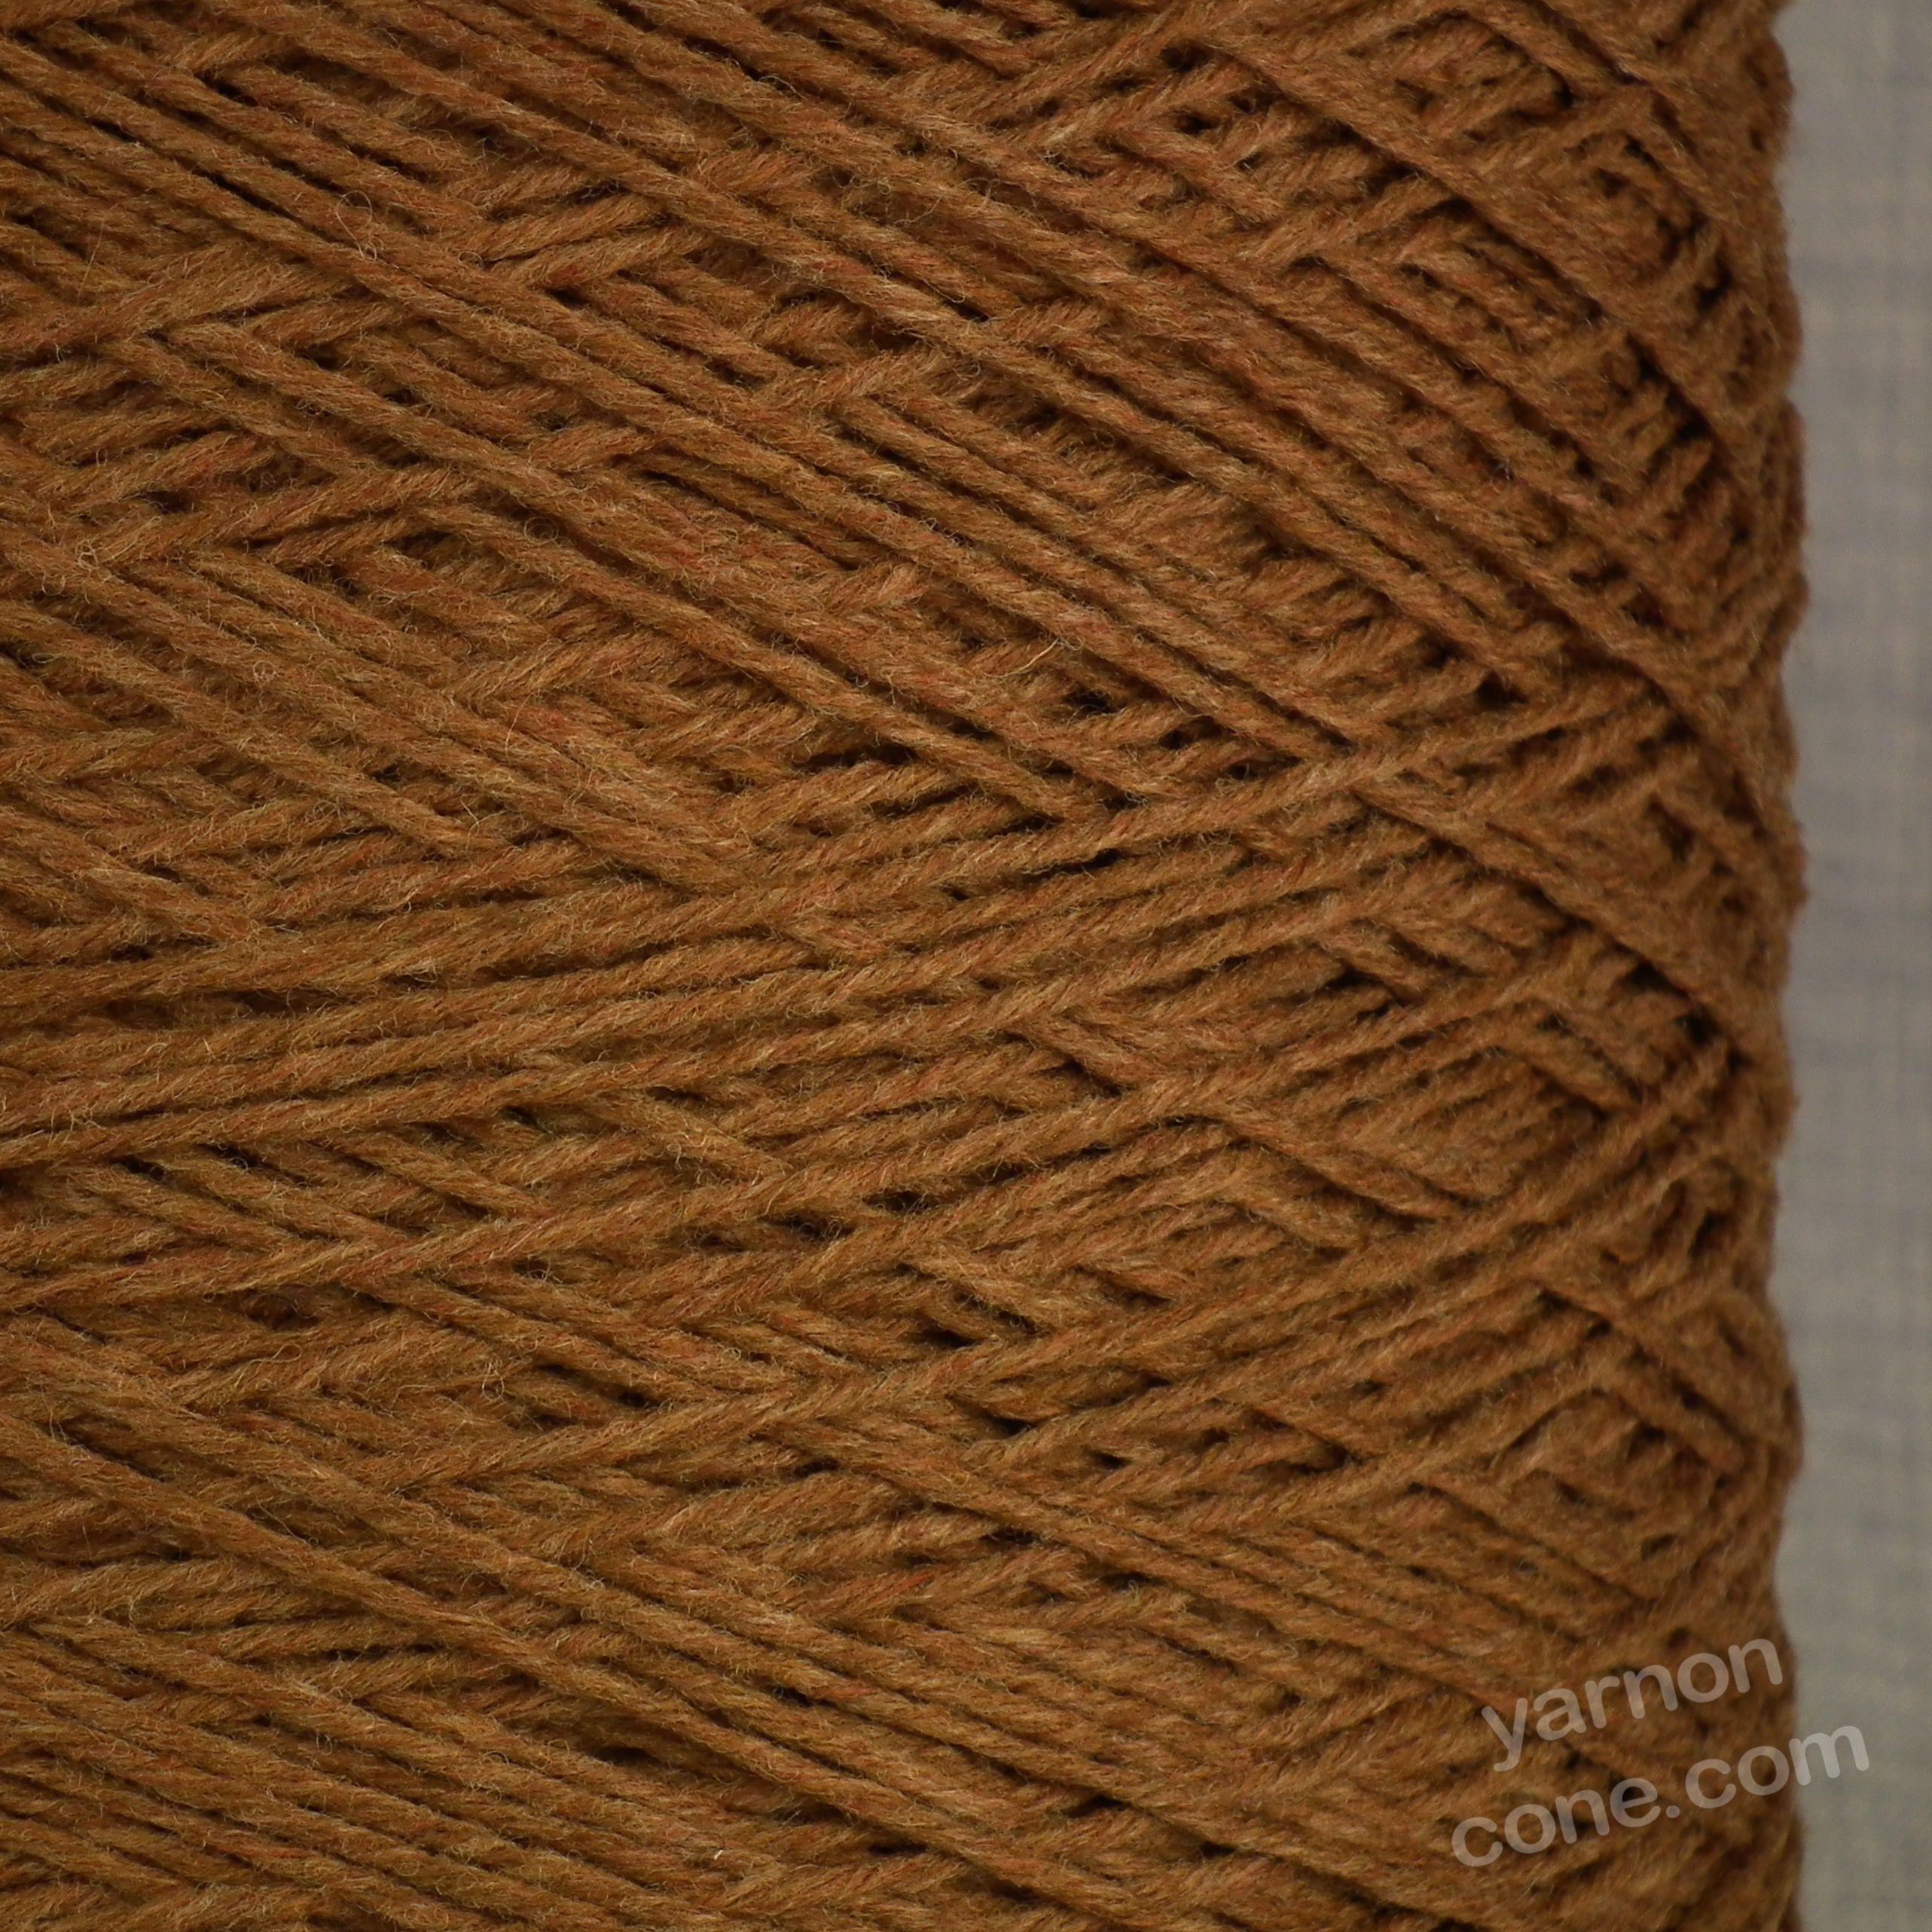 zegna baruffa hibiscus DK double knitting 100% pure fine merino wool yarn on cone